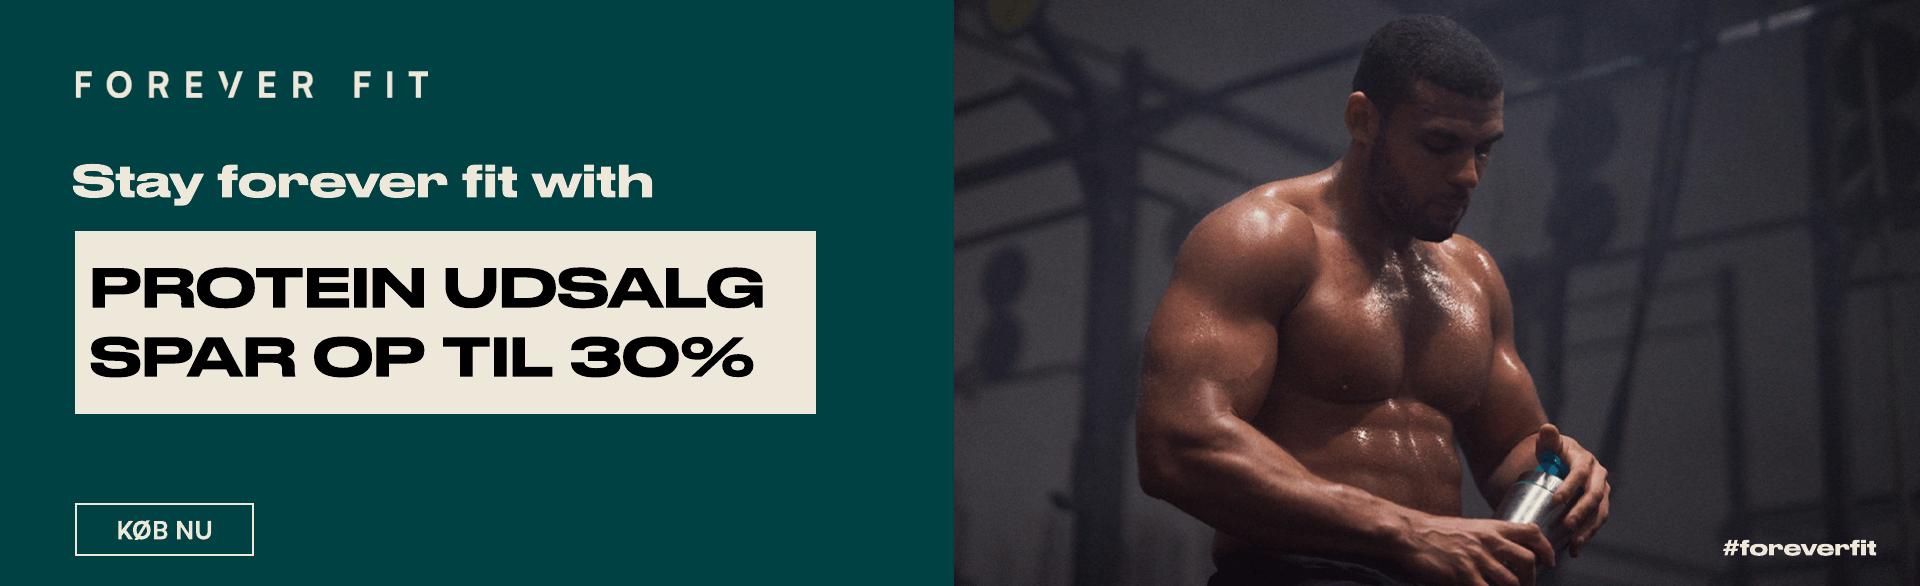 Protein udsalg - op til 30%